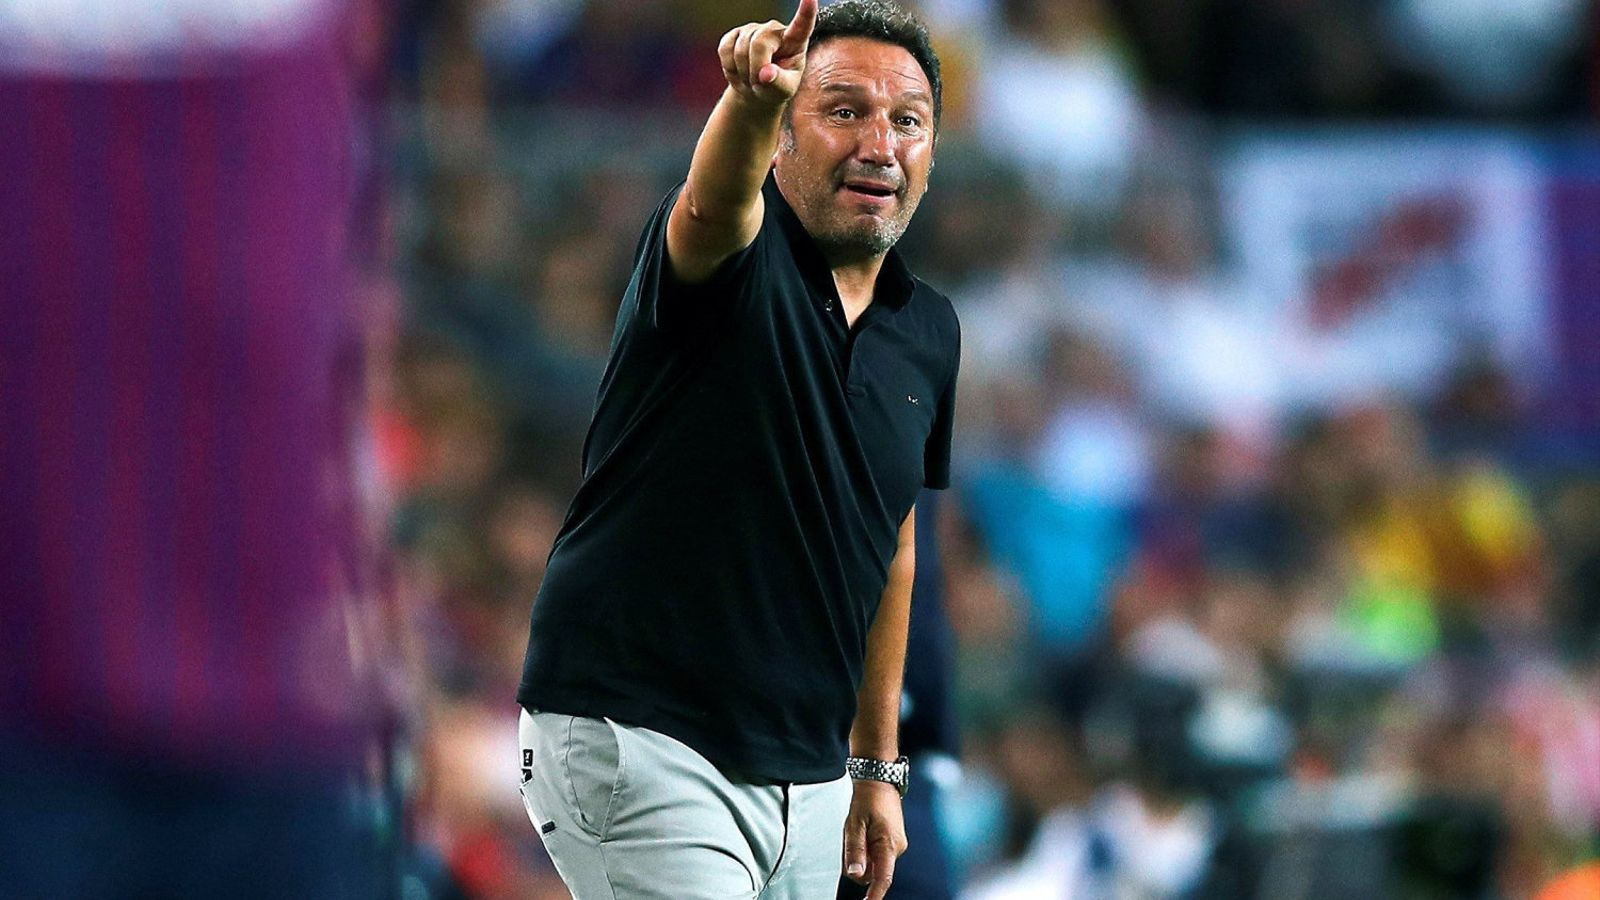 Eusebio Sacristán, entrenador del Girona, donant instruccions durant el partit al Camp Nou.